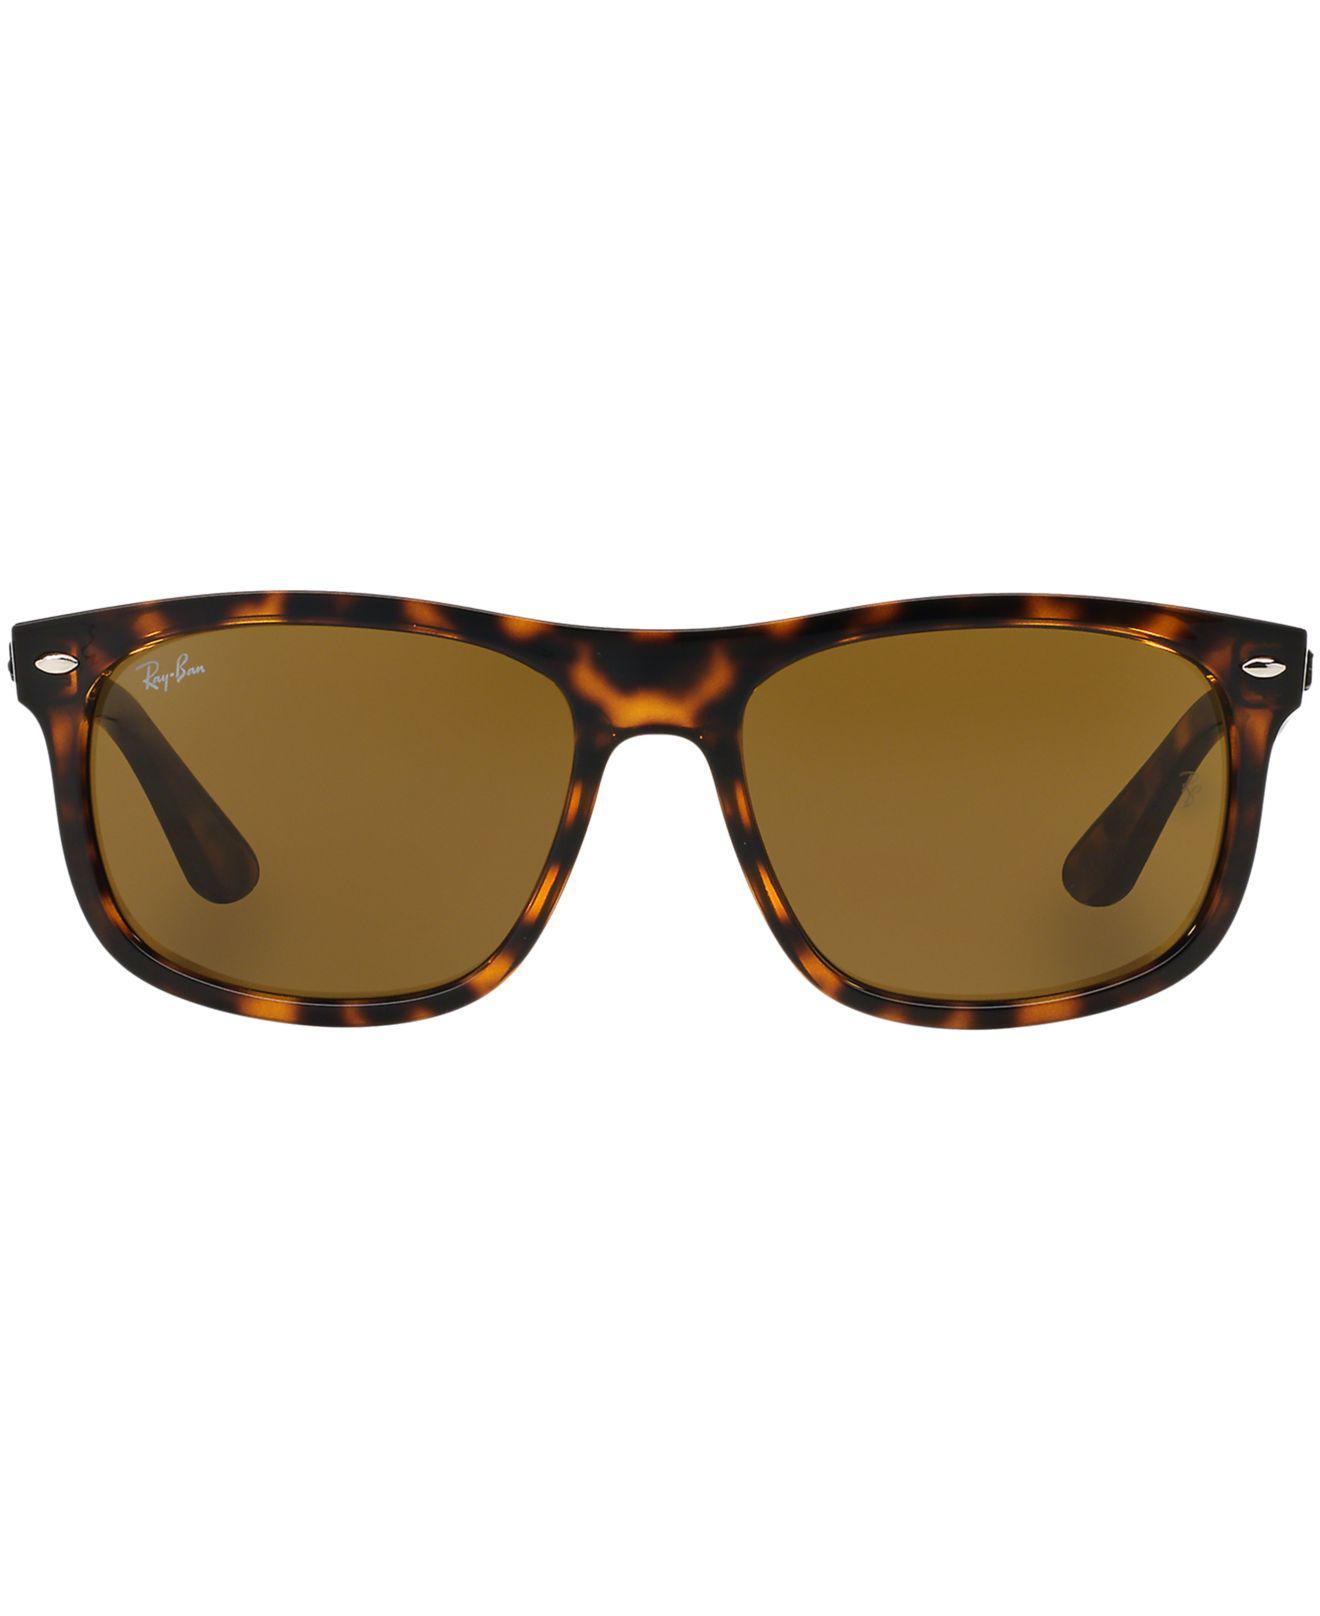 d77502cfb9 Lyst - Ray-Ban Sunglasses